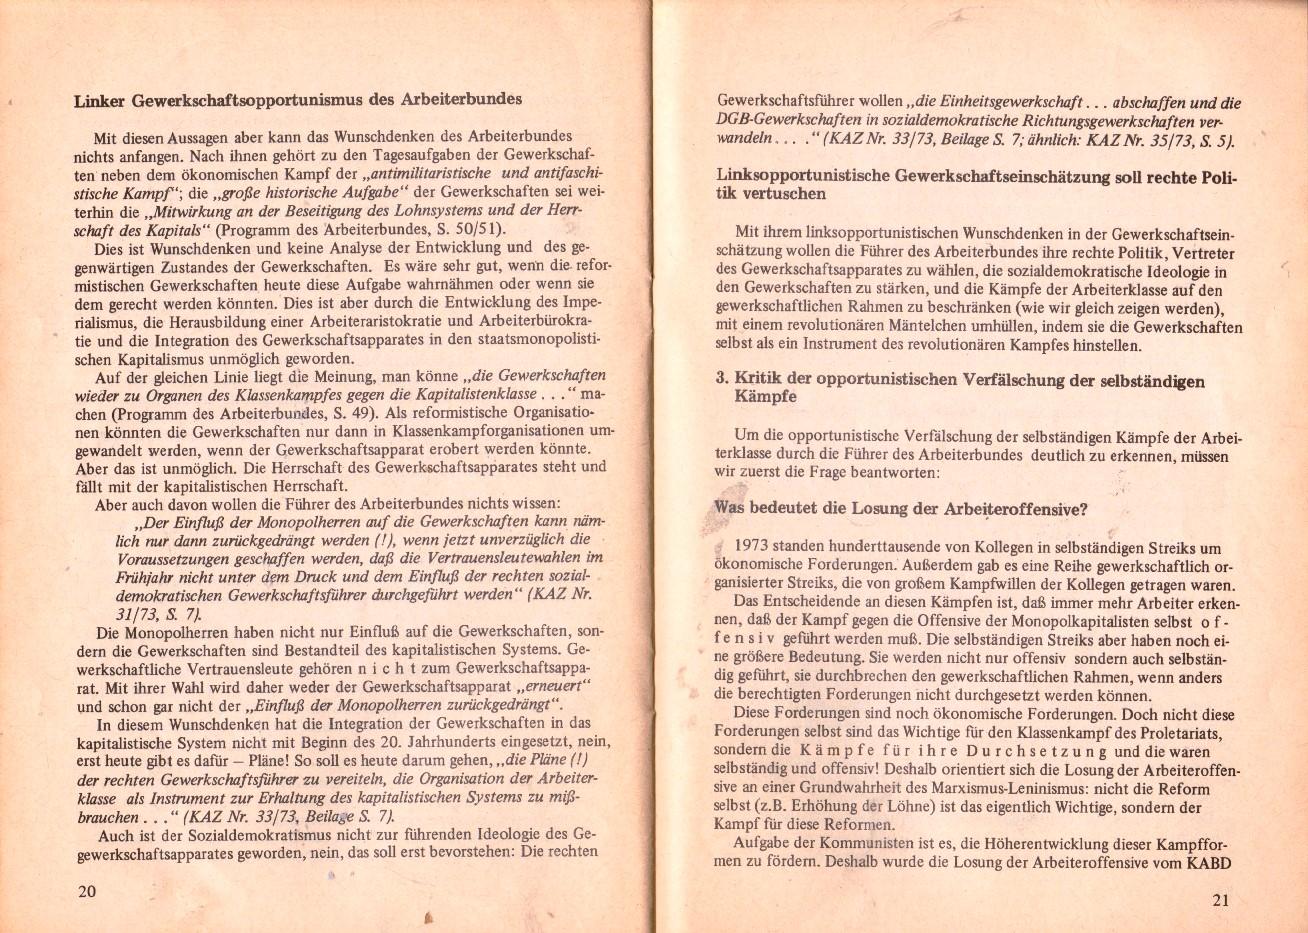 Muenchen_KABD_1974_Kritik_des_AB_12